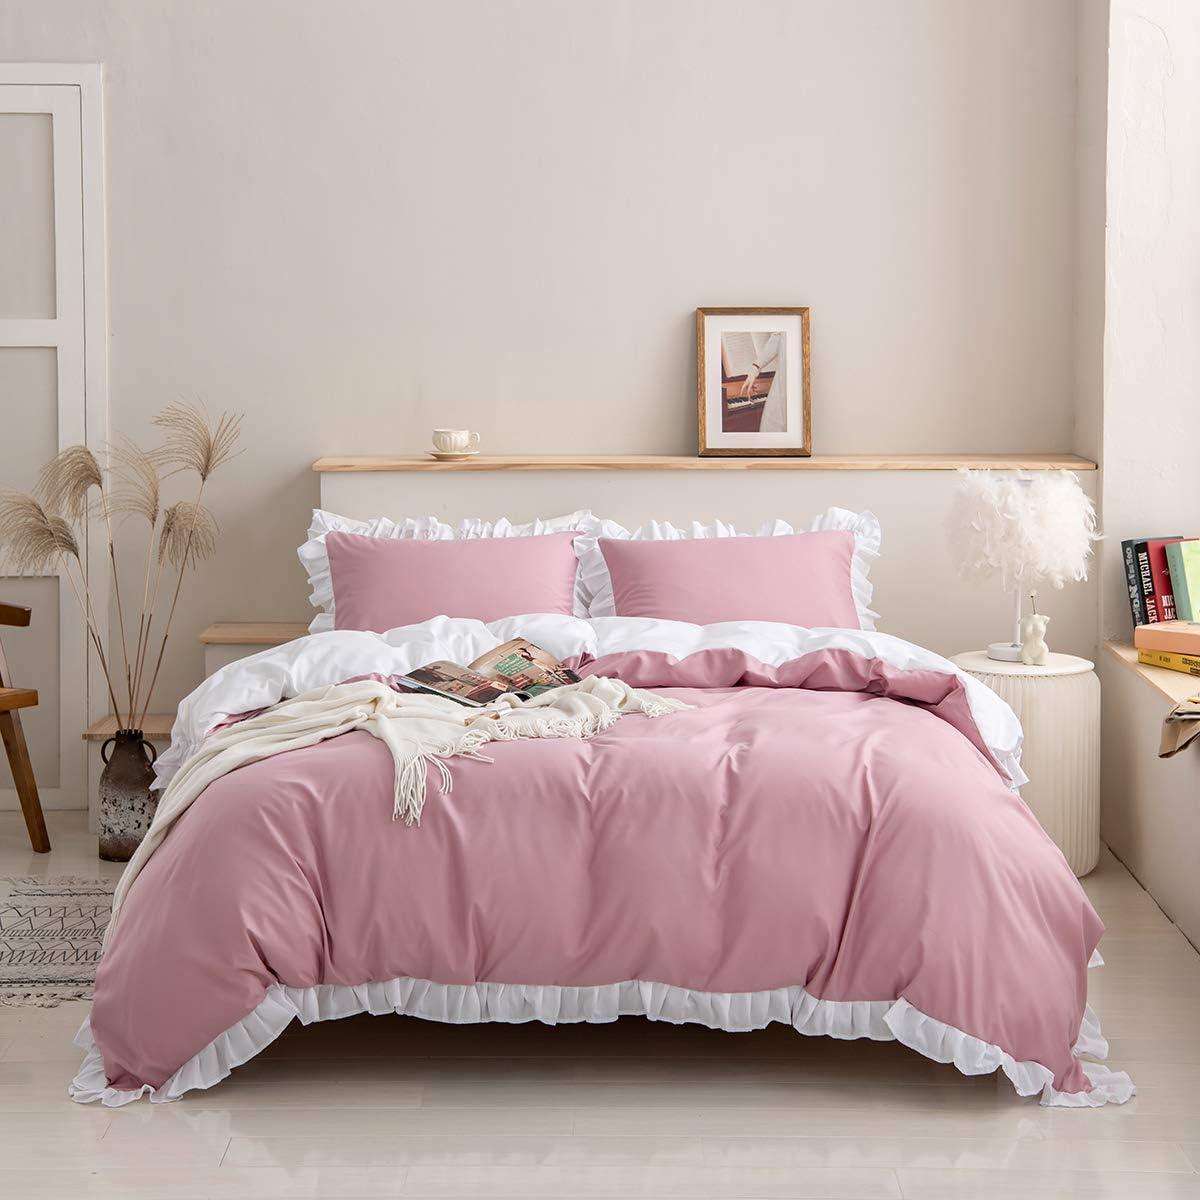 Erosebridal Pink Comforter Cover Twin Size for Kids Girls, White Ruffle Bedding Set Shabby Chic Duvet Cover Lightweight Reversible Bedspread Cover for Adult Women Bedroom Living Room Decor, 2 Pieces